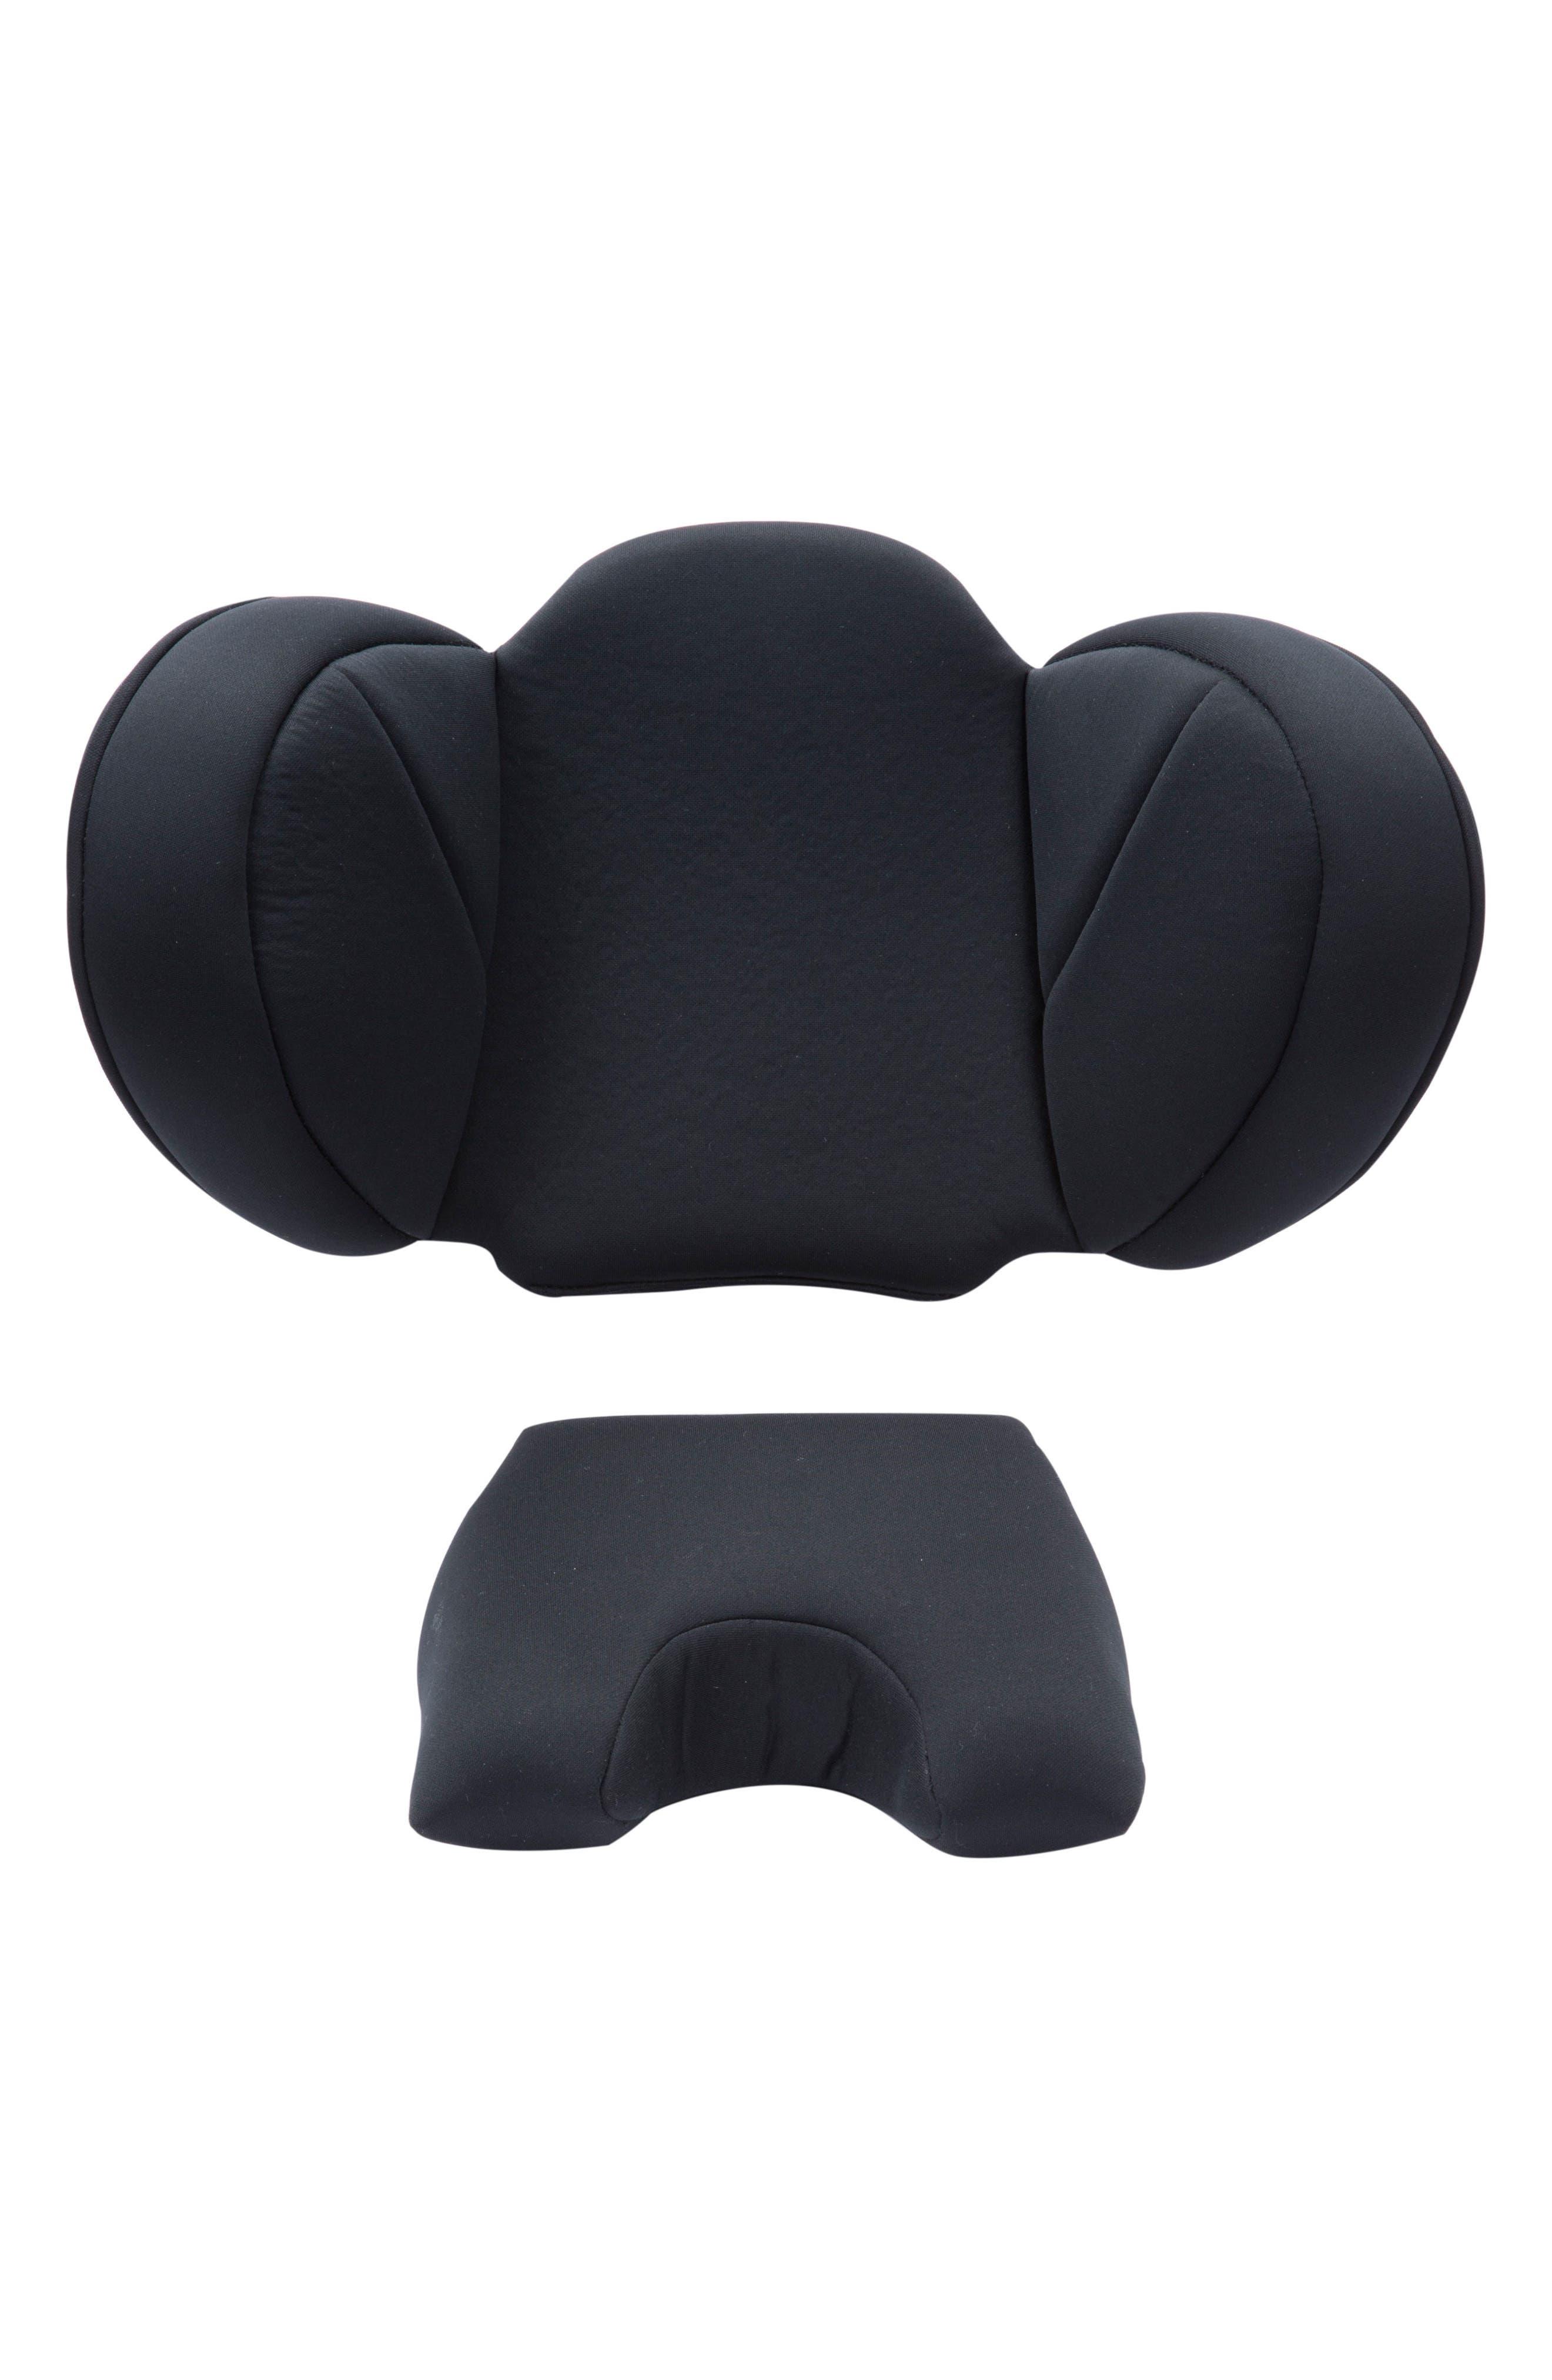 Pria<sup>™</sup> 85 Max Convertible Car Seat,                             Alternate thumbnail 14, color,                             Night Black